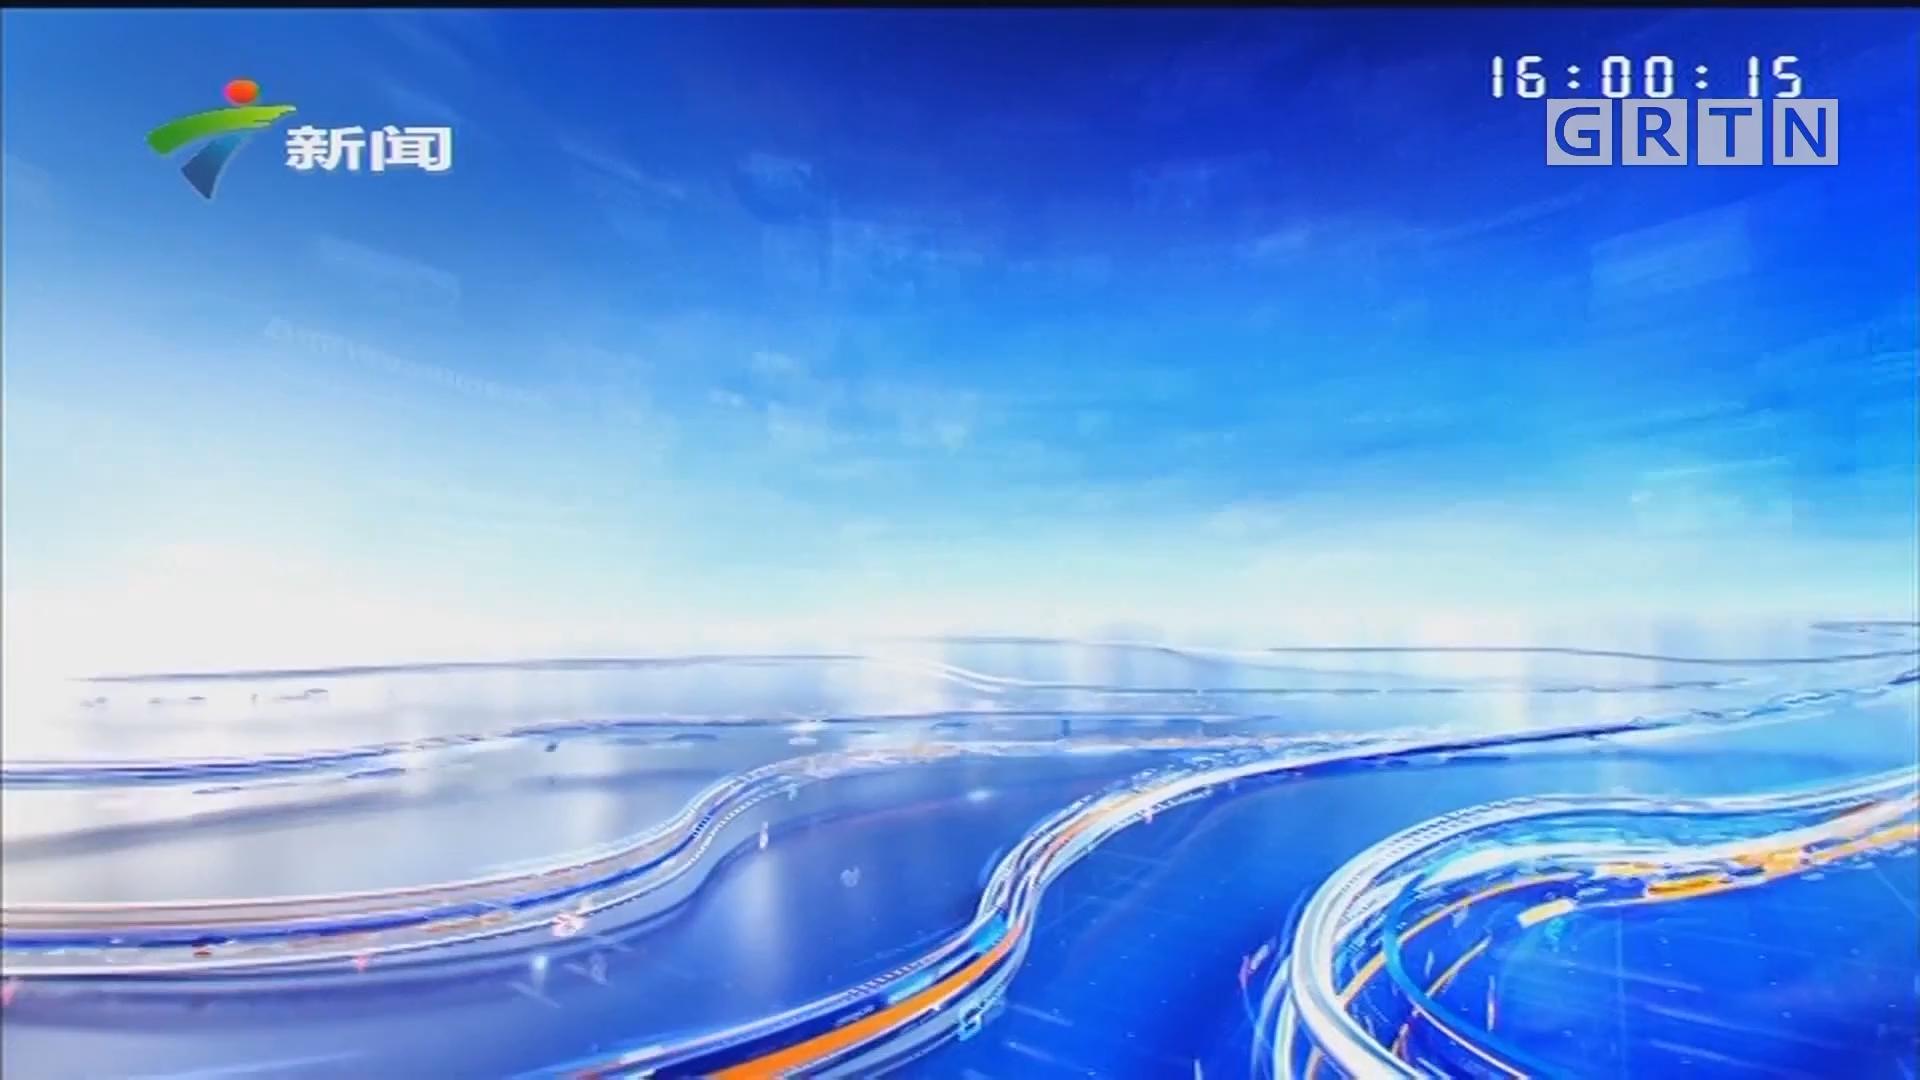 [HD][2019-06-01]直播广东:粤港澳三地举行丰富多彩的六一庆祝活动